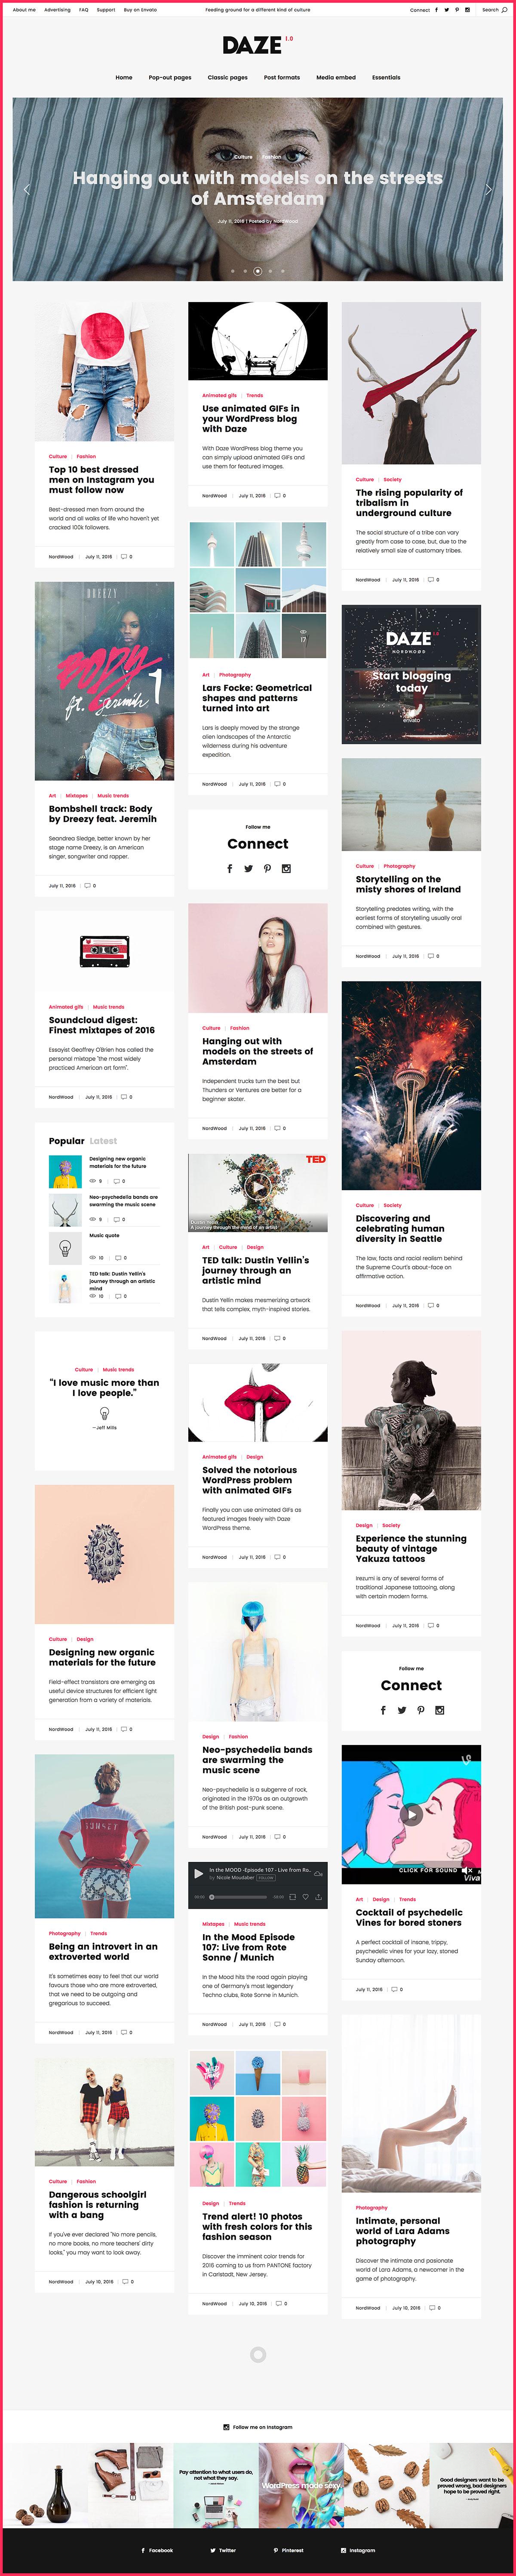 DAZE - A True Wall-Style Masonry WordPress Theme for blogs